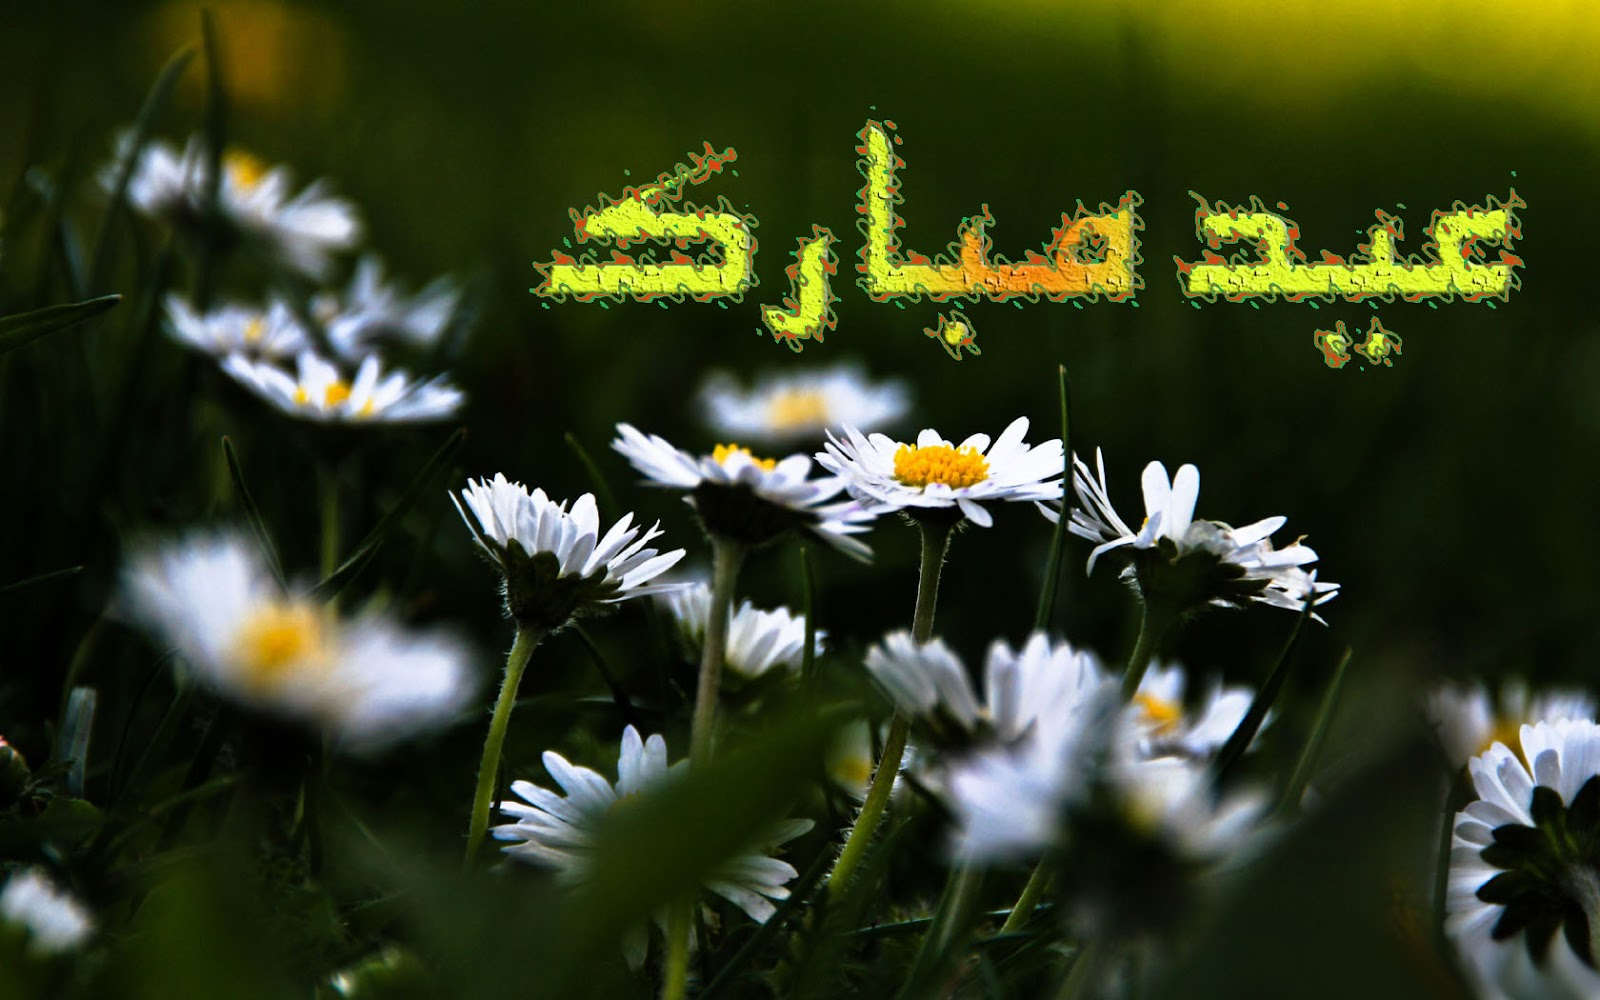 Eid ul adha zuha mubarak free e card wallpapers widescreen hd eid ul zuha adha mubarak card flower wallpapers urdu text izmirmasajfo